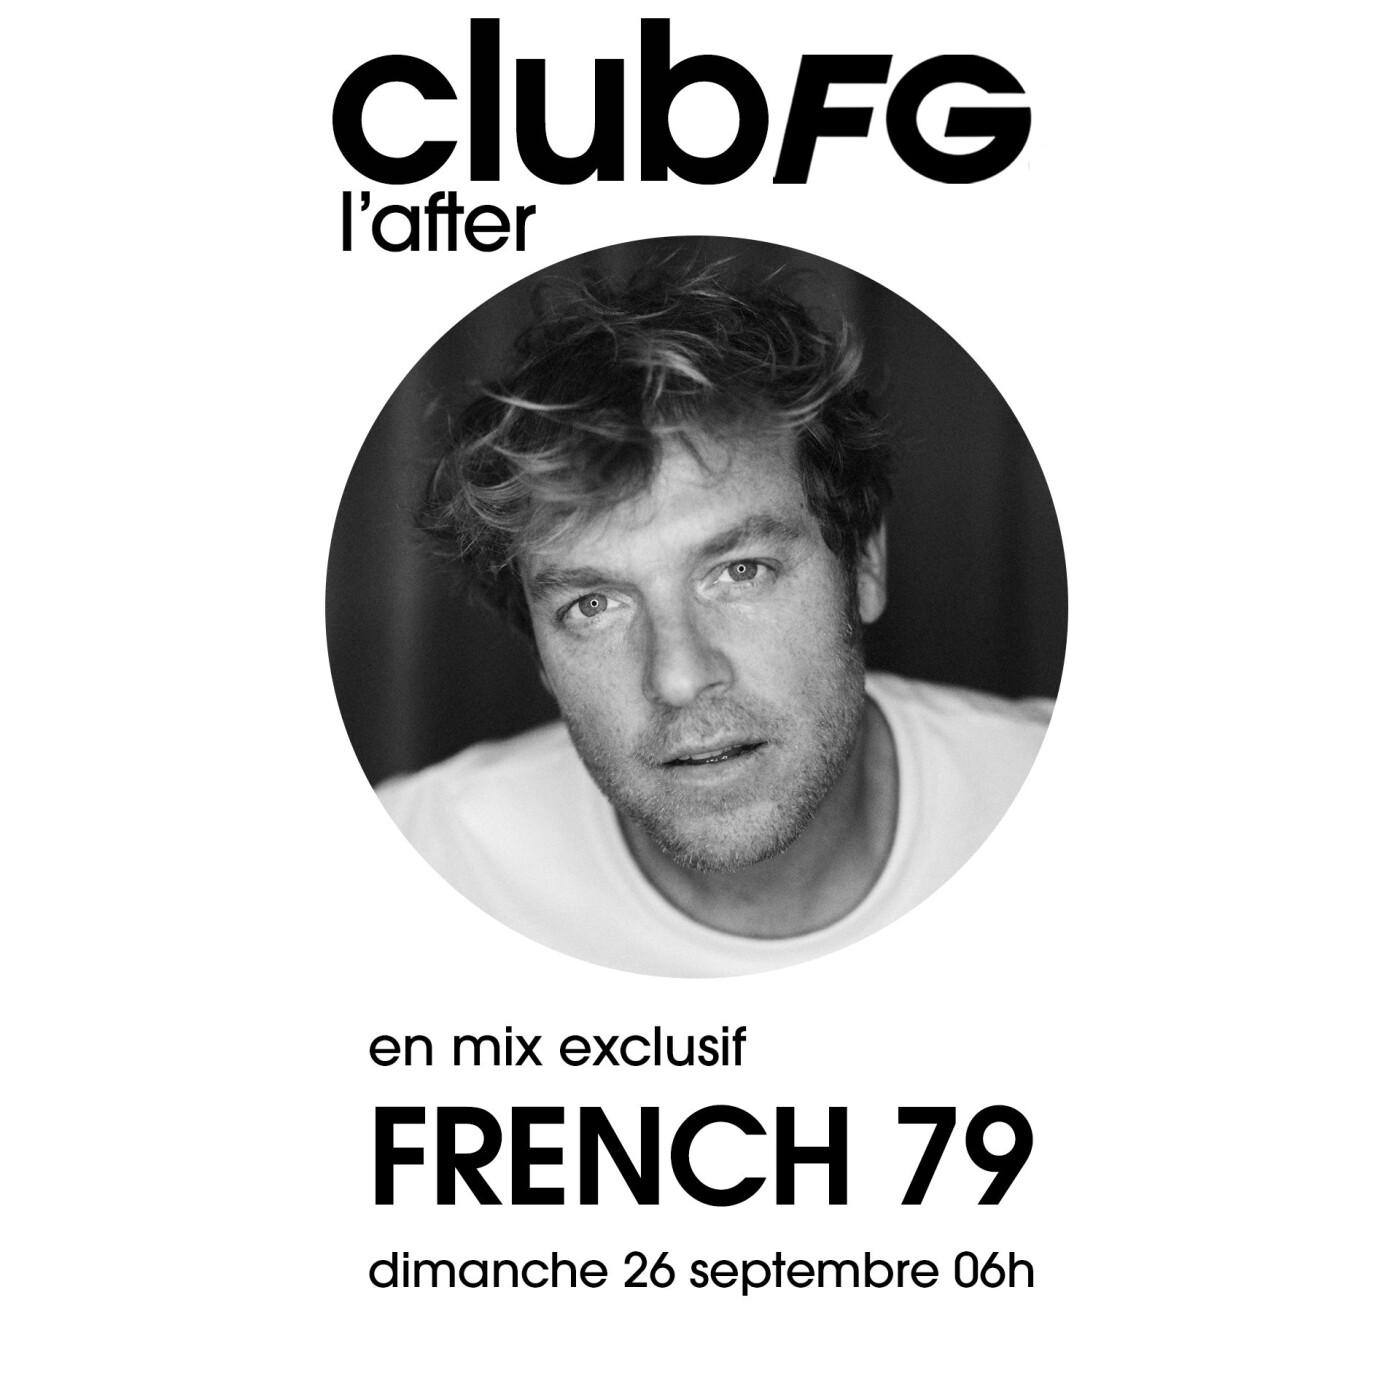 CLUB FG : FRENCH 79